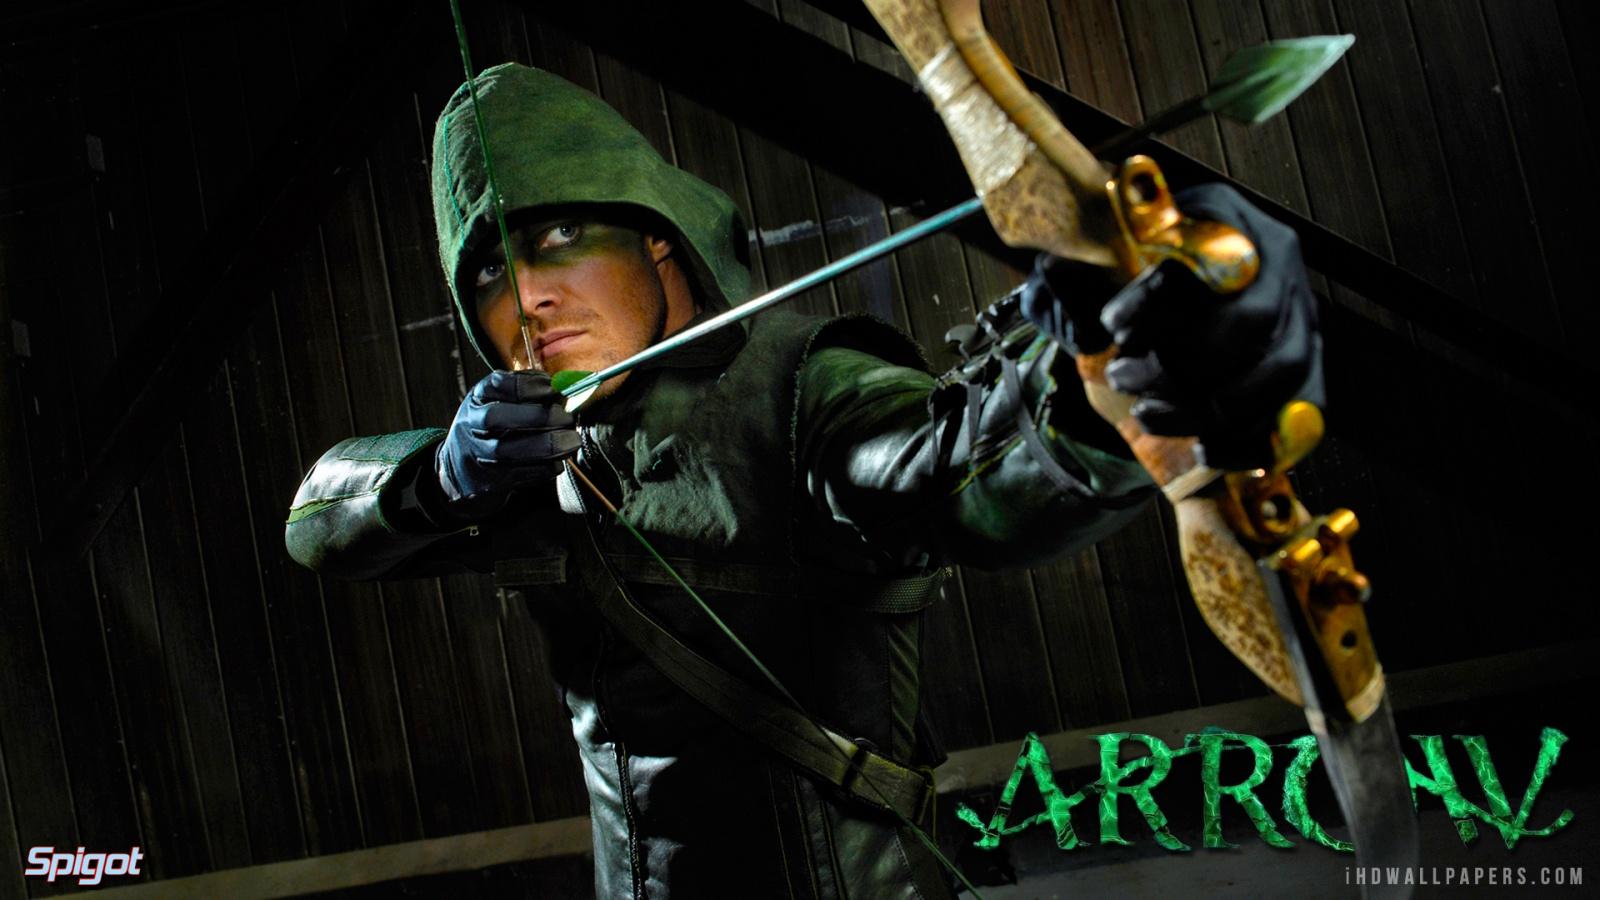 CW Arrow Wallpaper 1600x900